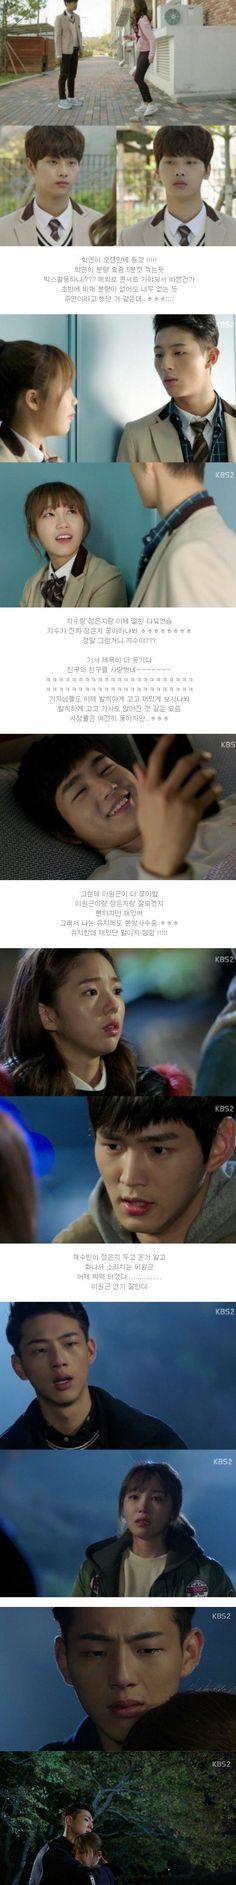 [Spoiler] Added episode 8 captures for the Korean drama 'Cheeky Go Go' @ HanCinema :: The Korean Movie and Drama Database